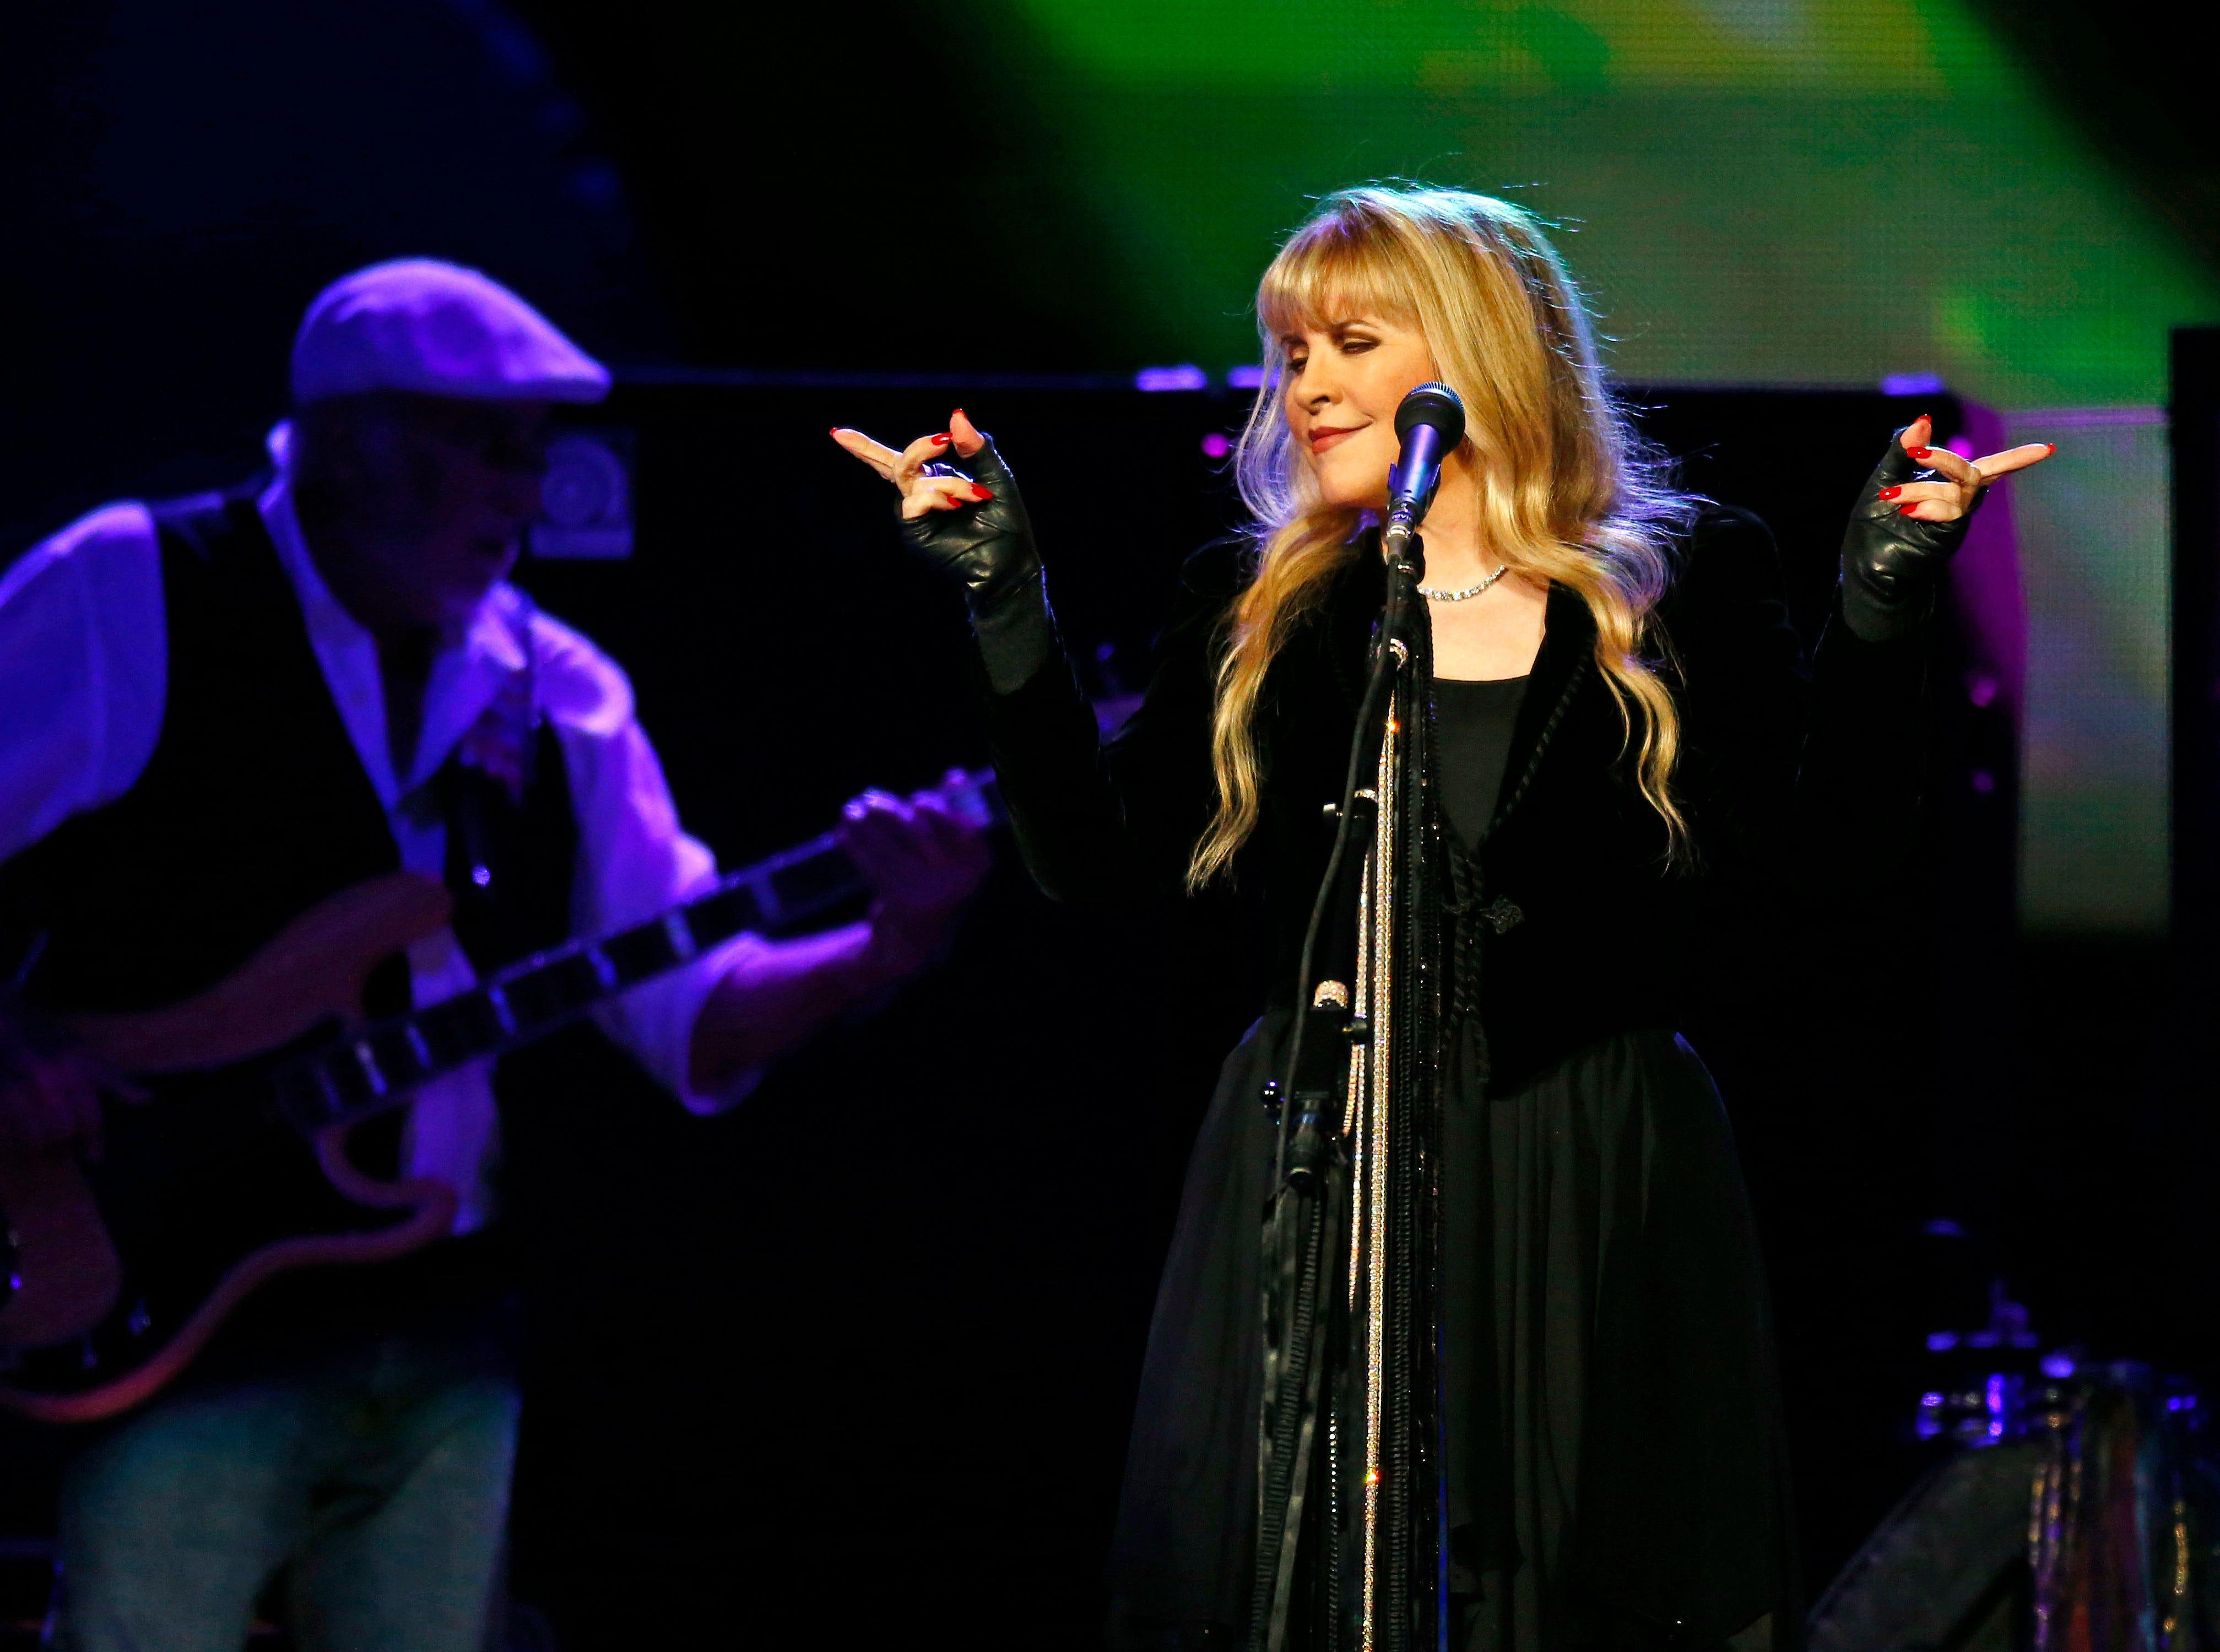 Fleetwood Mac's Stevie Nicks and bassist John McVie perform May 30, 2013, at U.S. Airways Center in Phoenix.